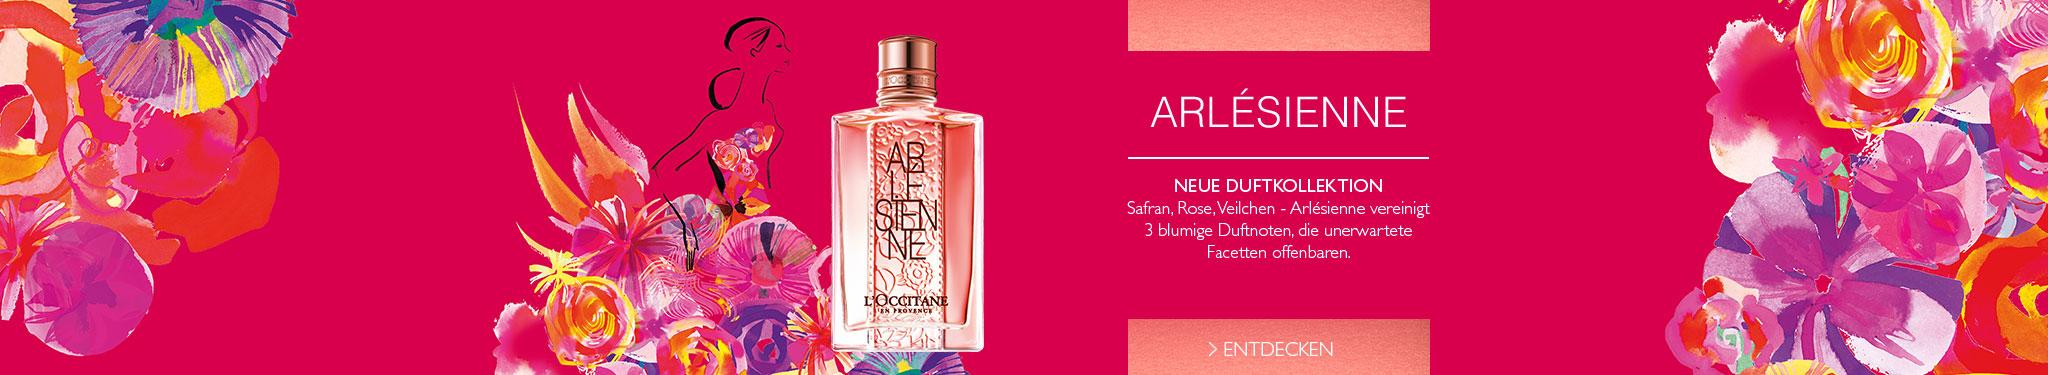 Arlésienne Parfum